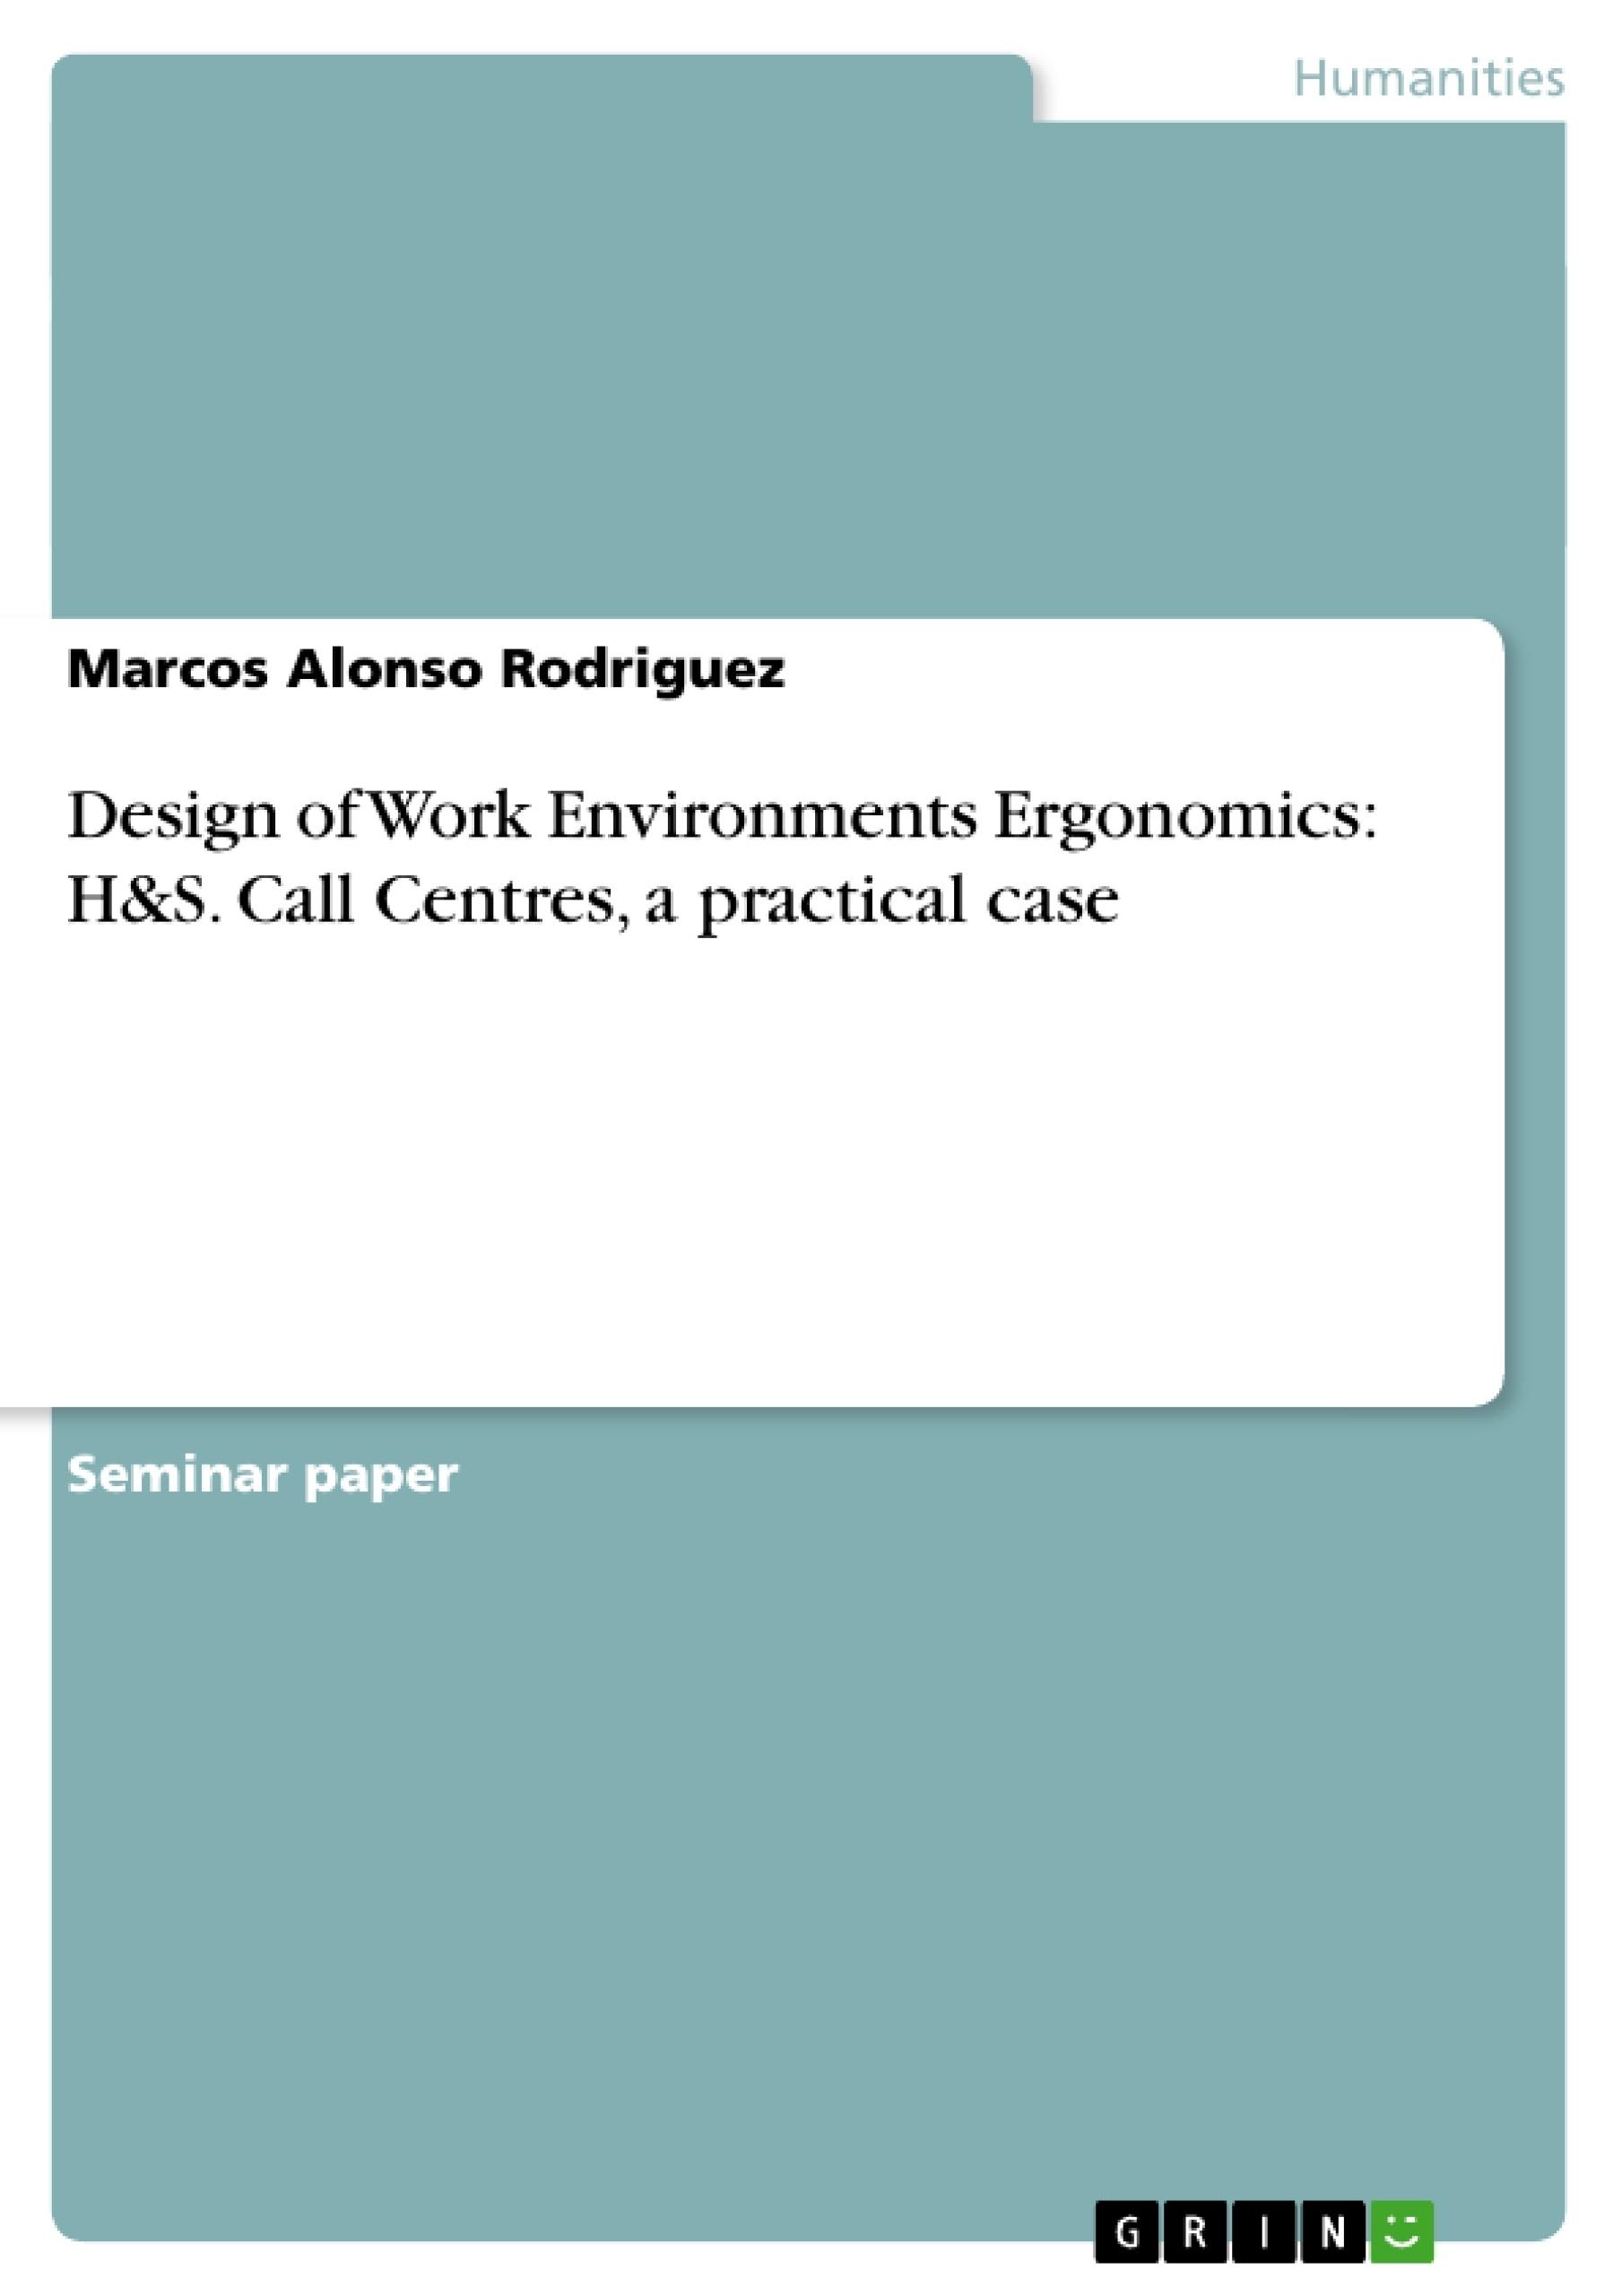 Title: Design of Work Environments Ergonomics: H&S. Call Centres, a practical case